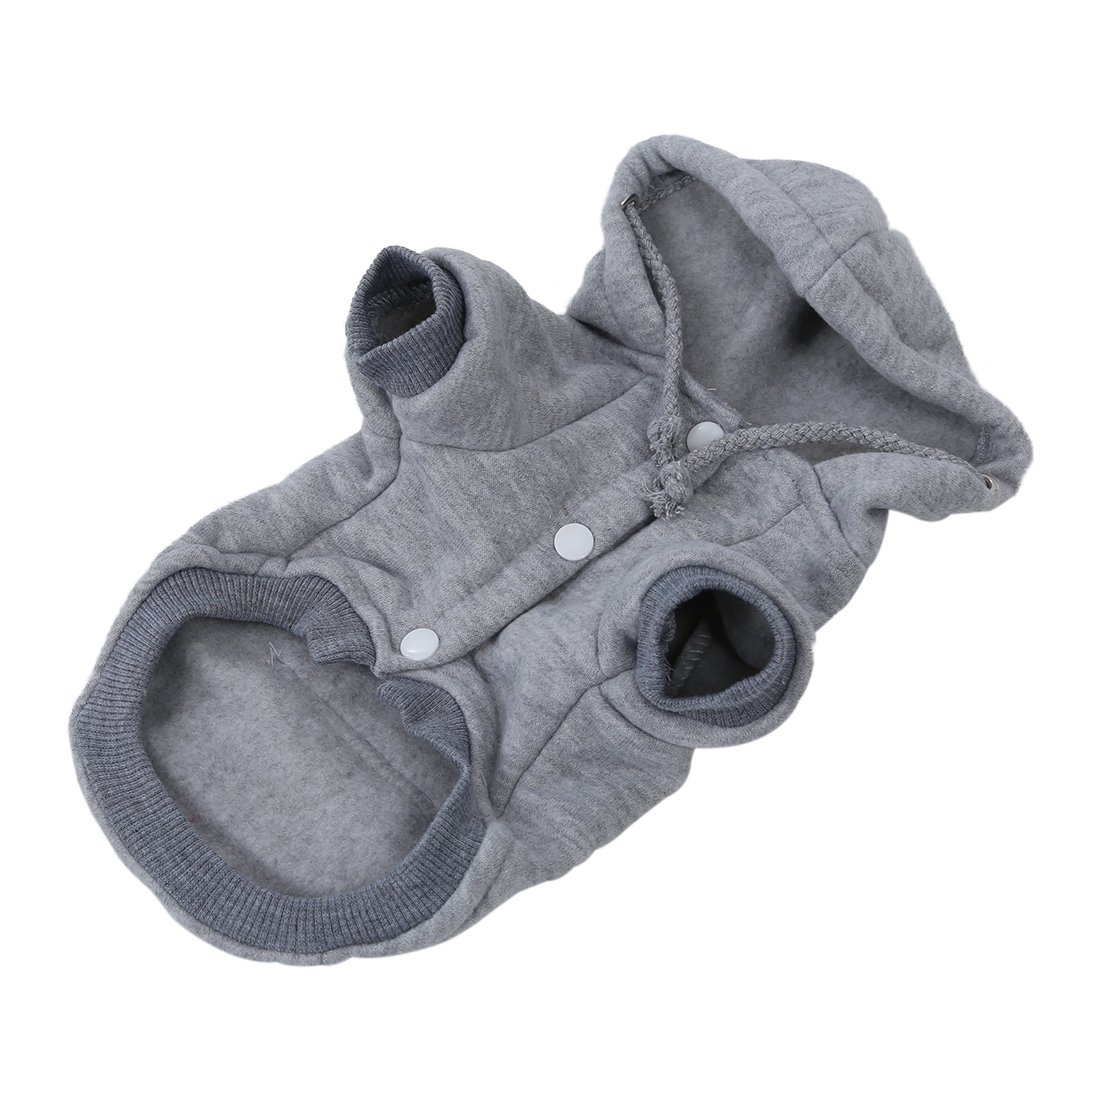 strickhundejacke mit kapuze weihnachtswelpen mantel kleidung grau xl l6f8 ebay. Black Bedroom Furniture Sets. Home Design Ideas